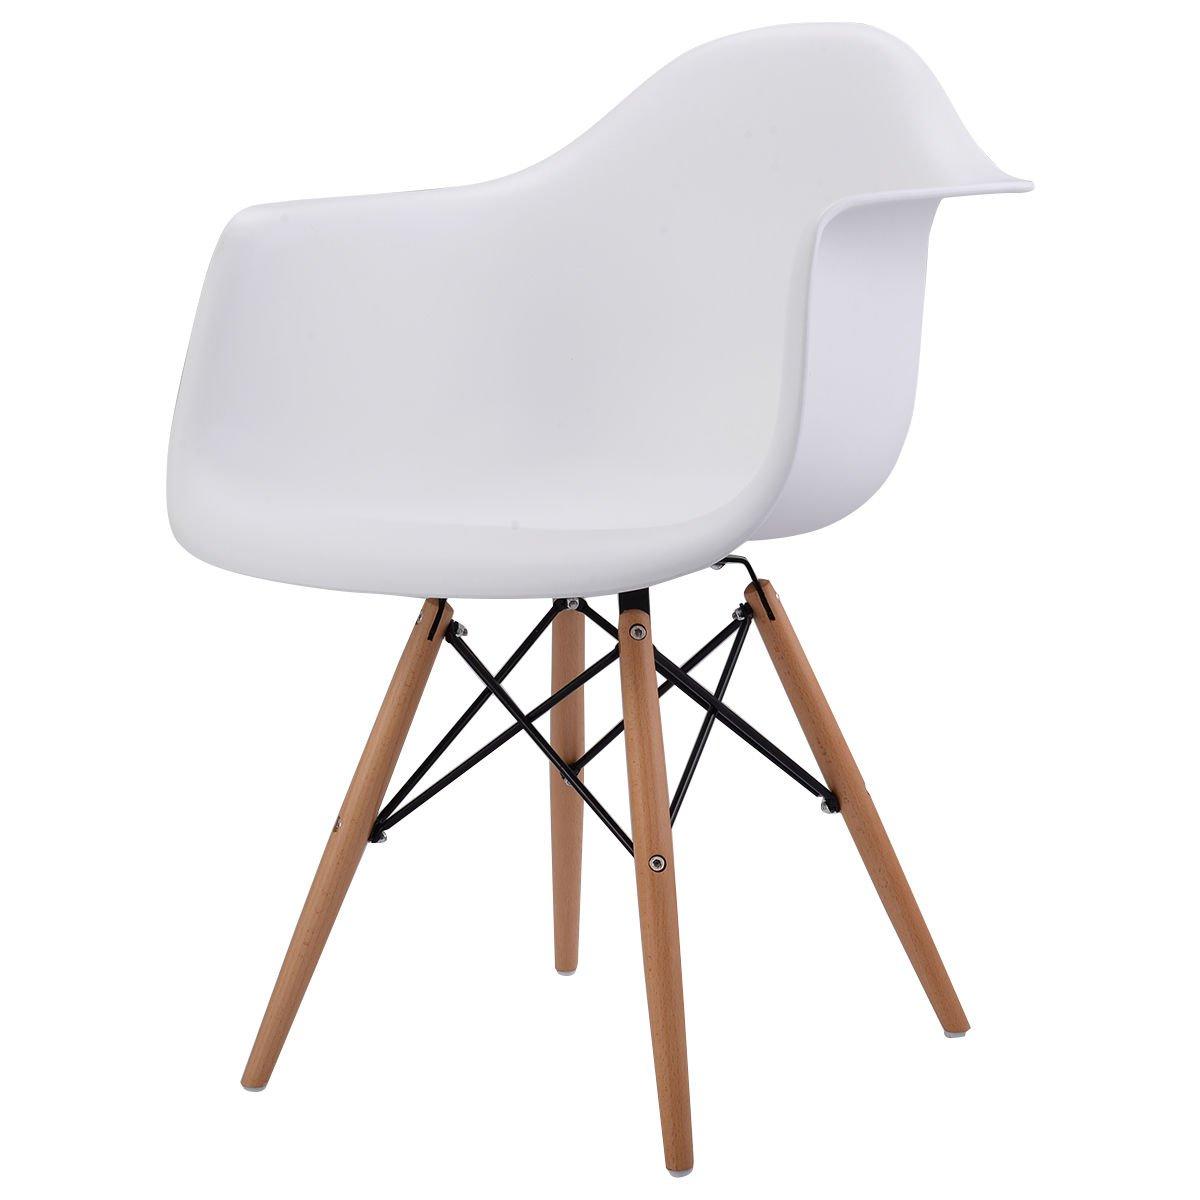 Giantex 1 PC Mid Century Modern Molded Plastic Style Dining Arm Chair Wood Legs